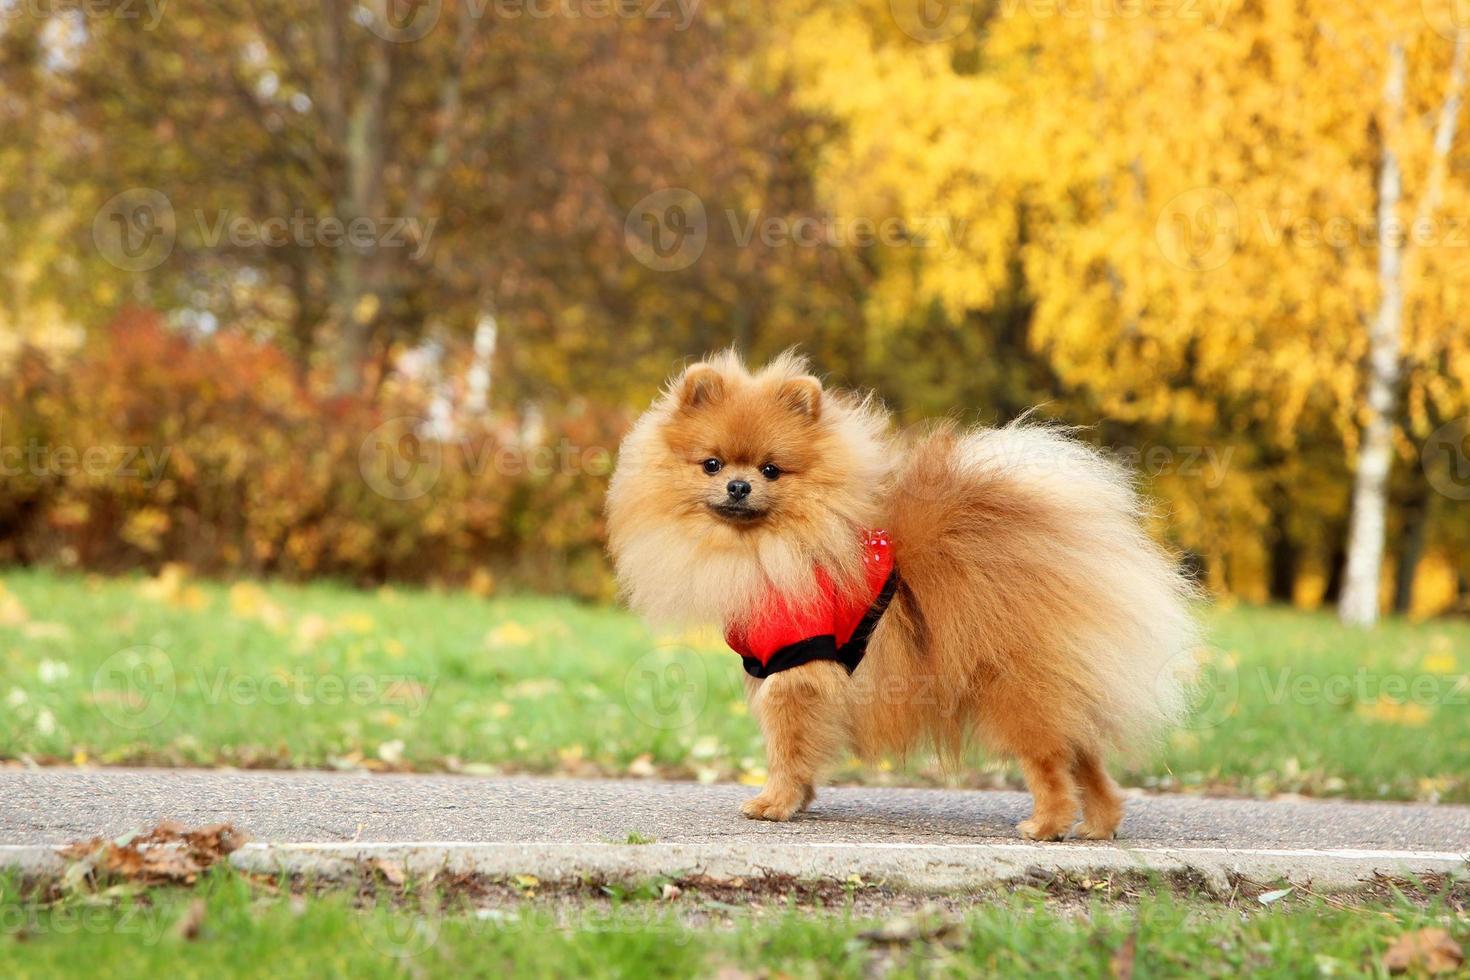 grappige herfst pommeren hond. foto